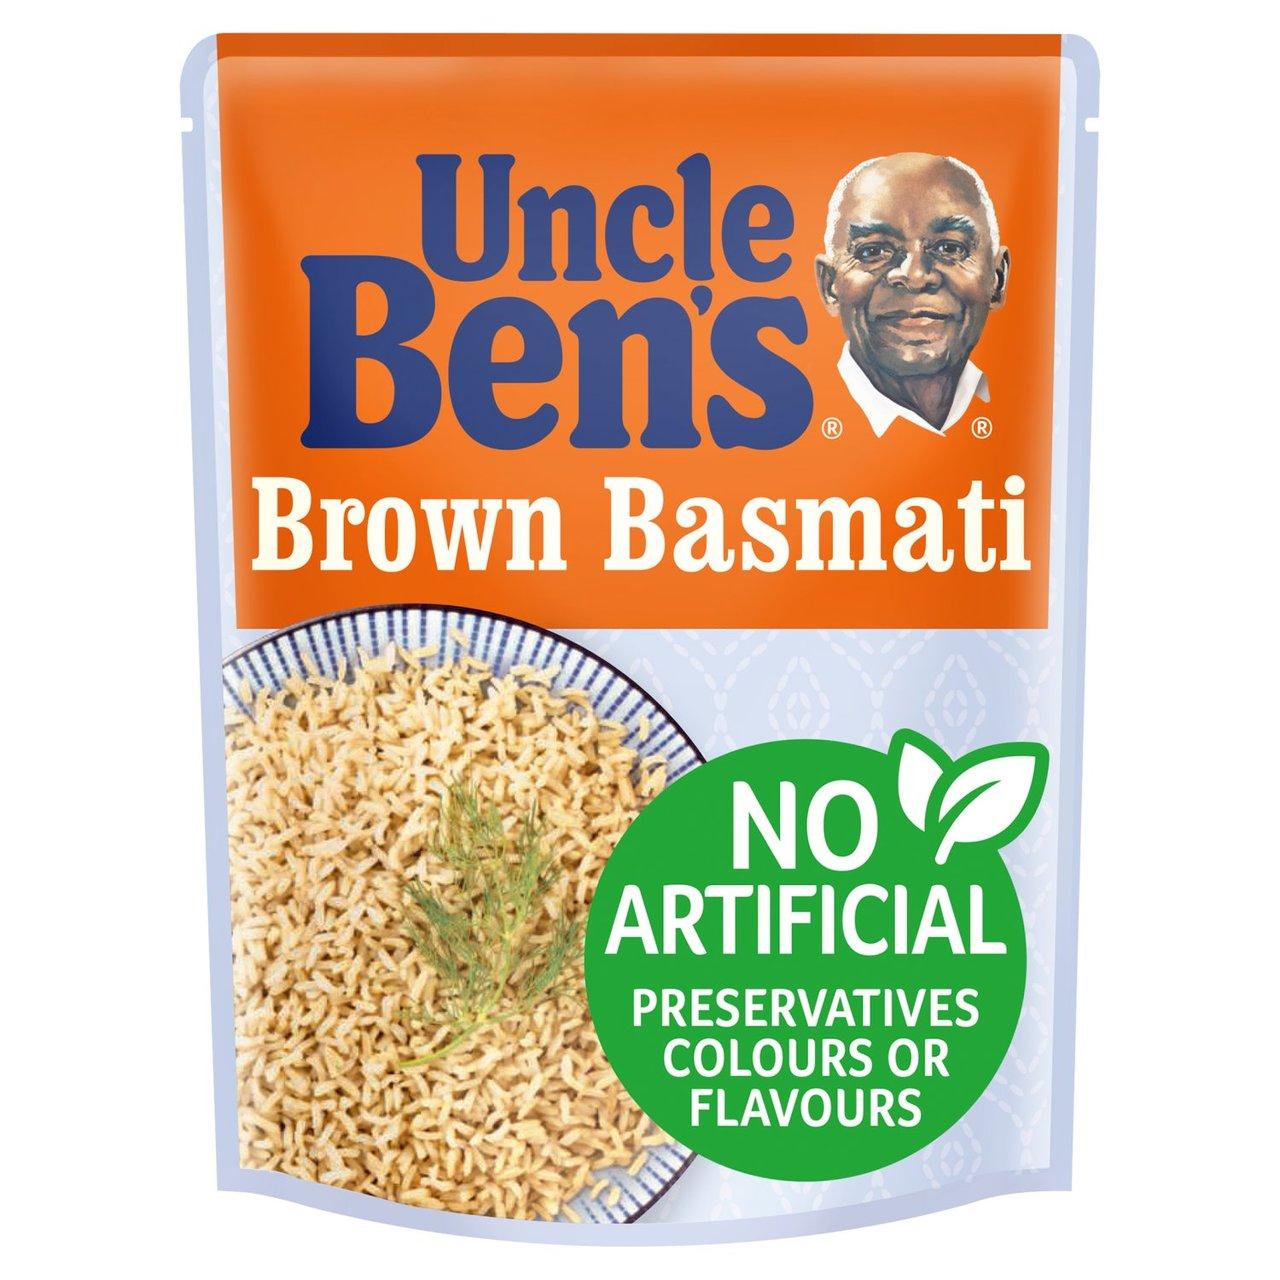 Uncle Bens Brown Basmati 250G or Uncle Ben's Mushroom Rice, 250g 62p @ Sainsbury's Cromwell Rd London